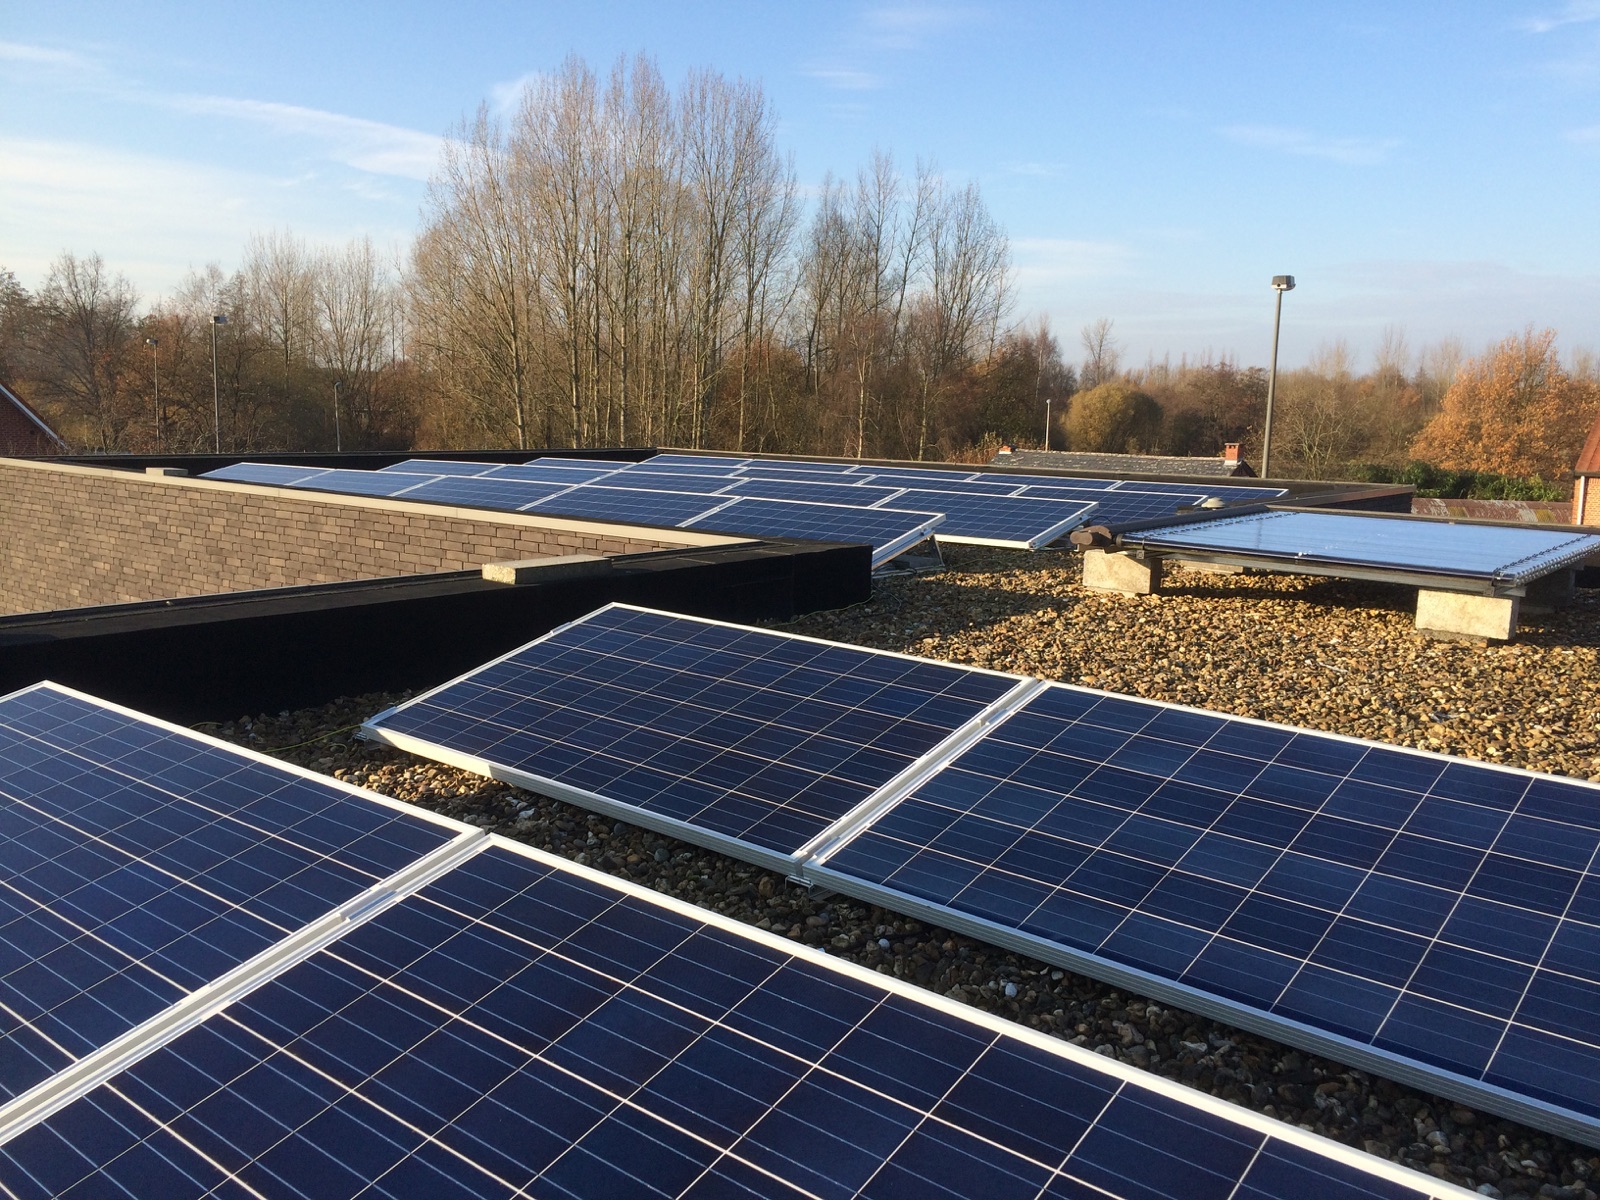 Neerpelt zonnepanelen dak